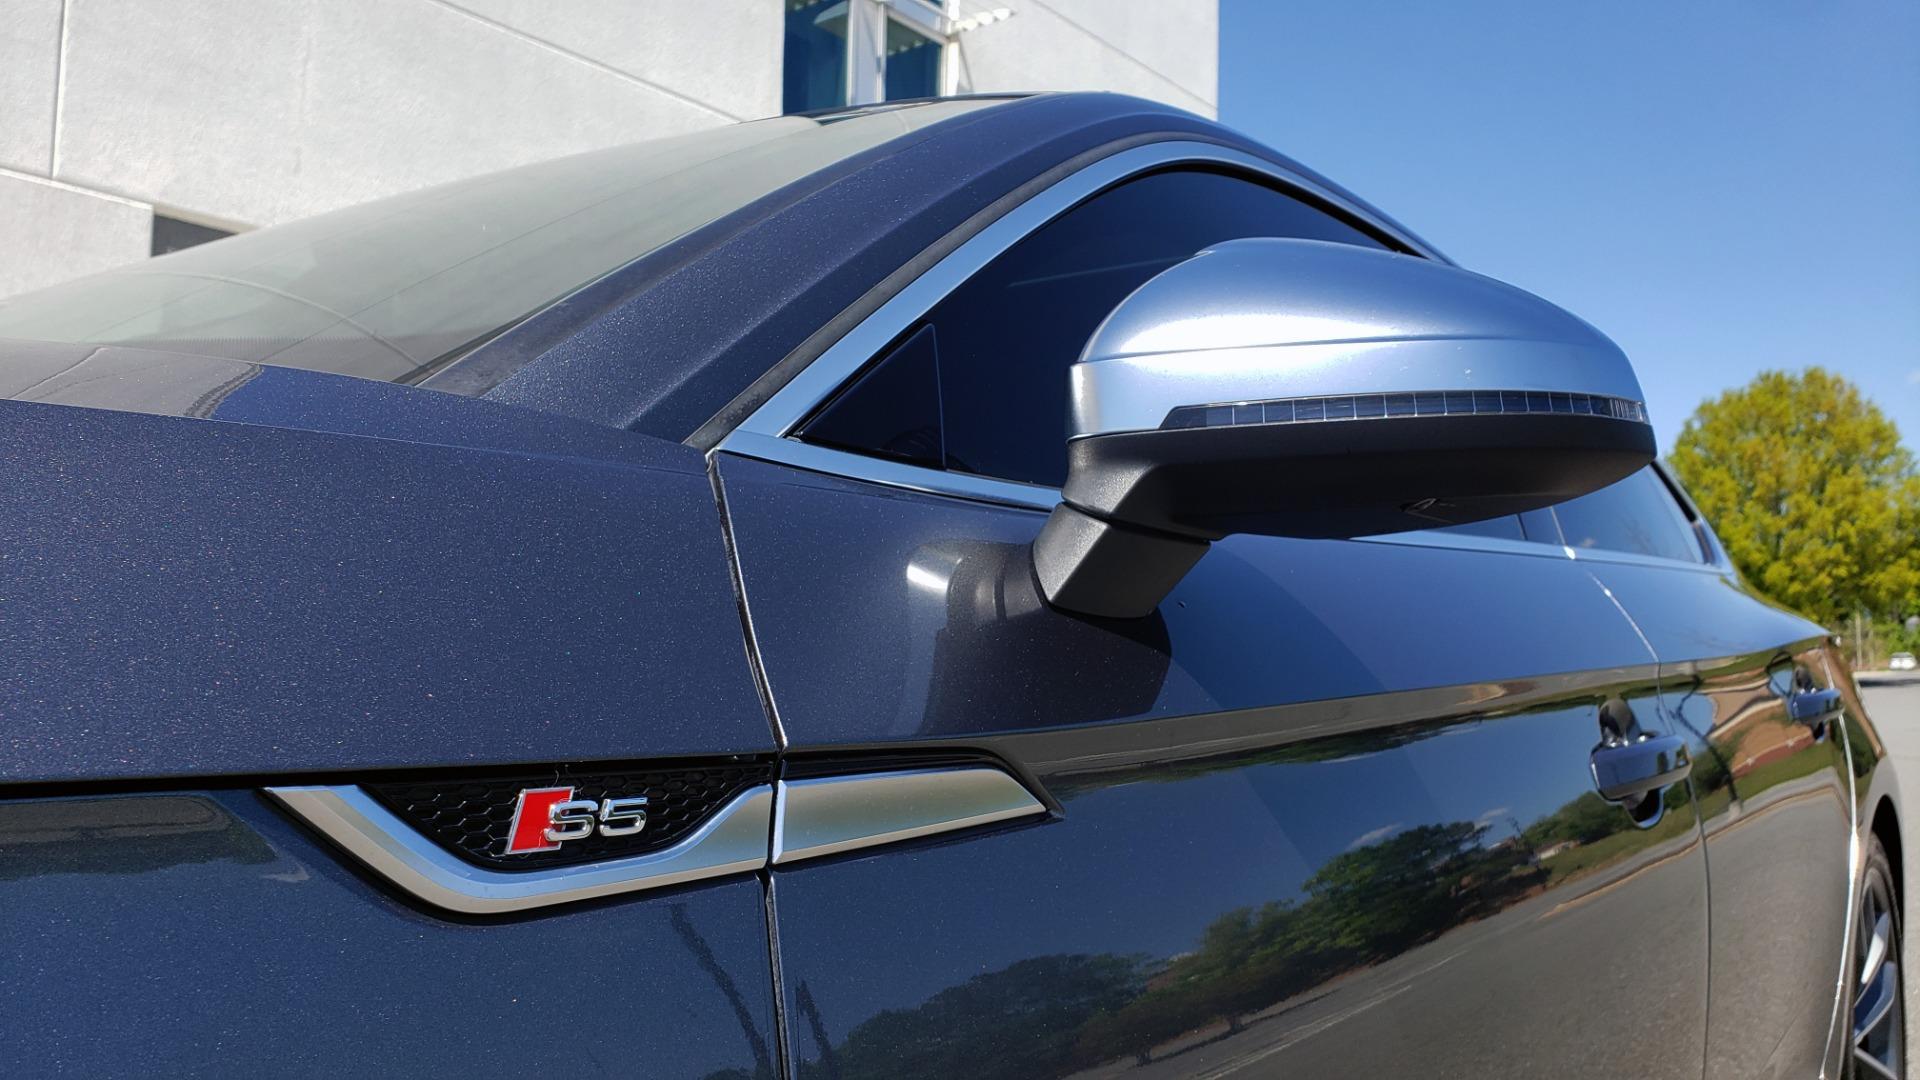 Used 2018 Audi S5 SPORTBACK PRESTIGE S-SPORT / NAV / SUNROOF / HUD / B&O SND / REARVIEW for sale $48,995 at Formula Imports in Charlotte NC 28227 8